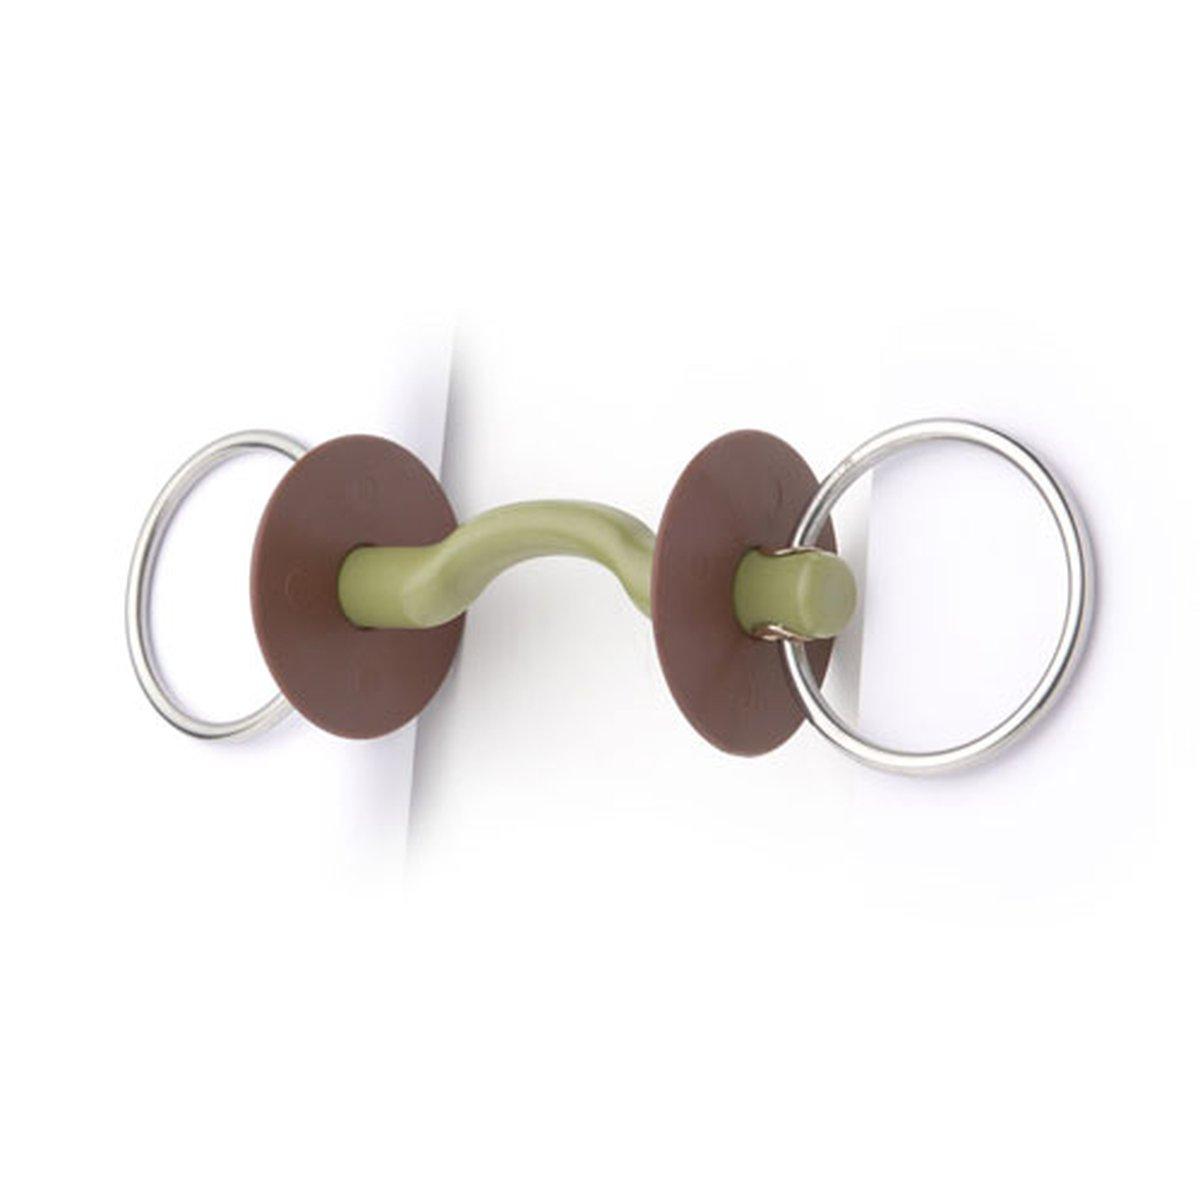 Afbeelding van Beris Springbit Stang/tongvr. Ring 7,5cm 12cm Soft